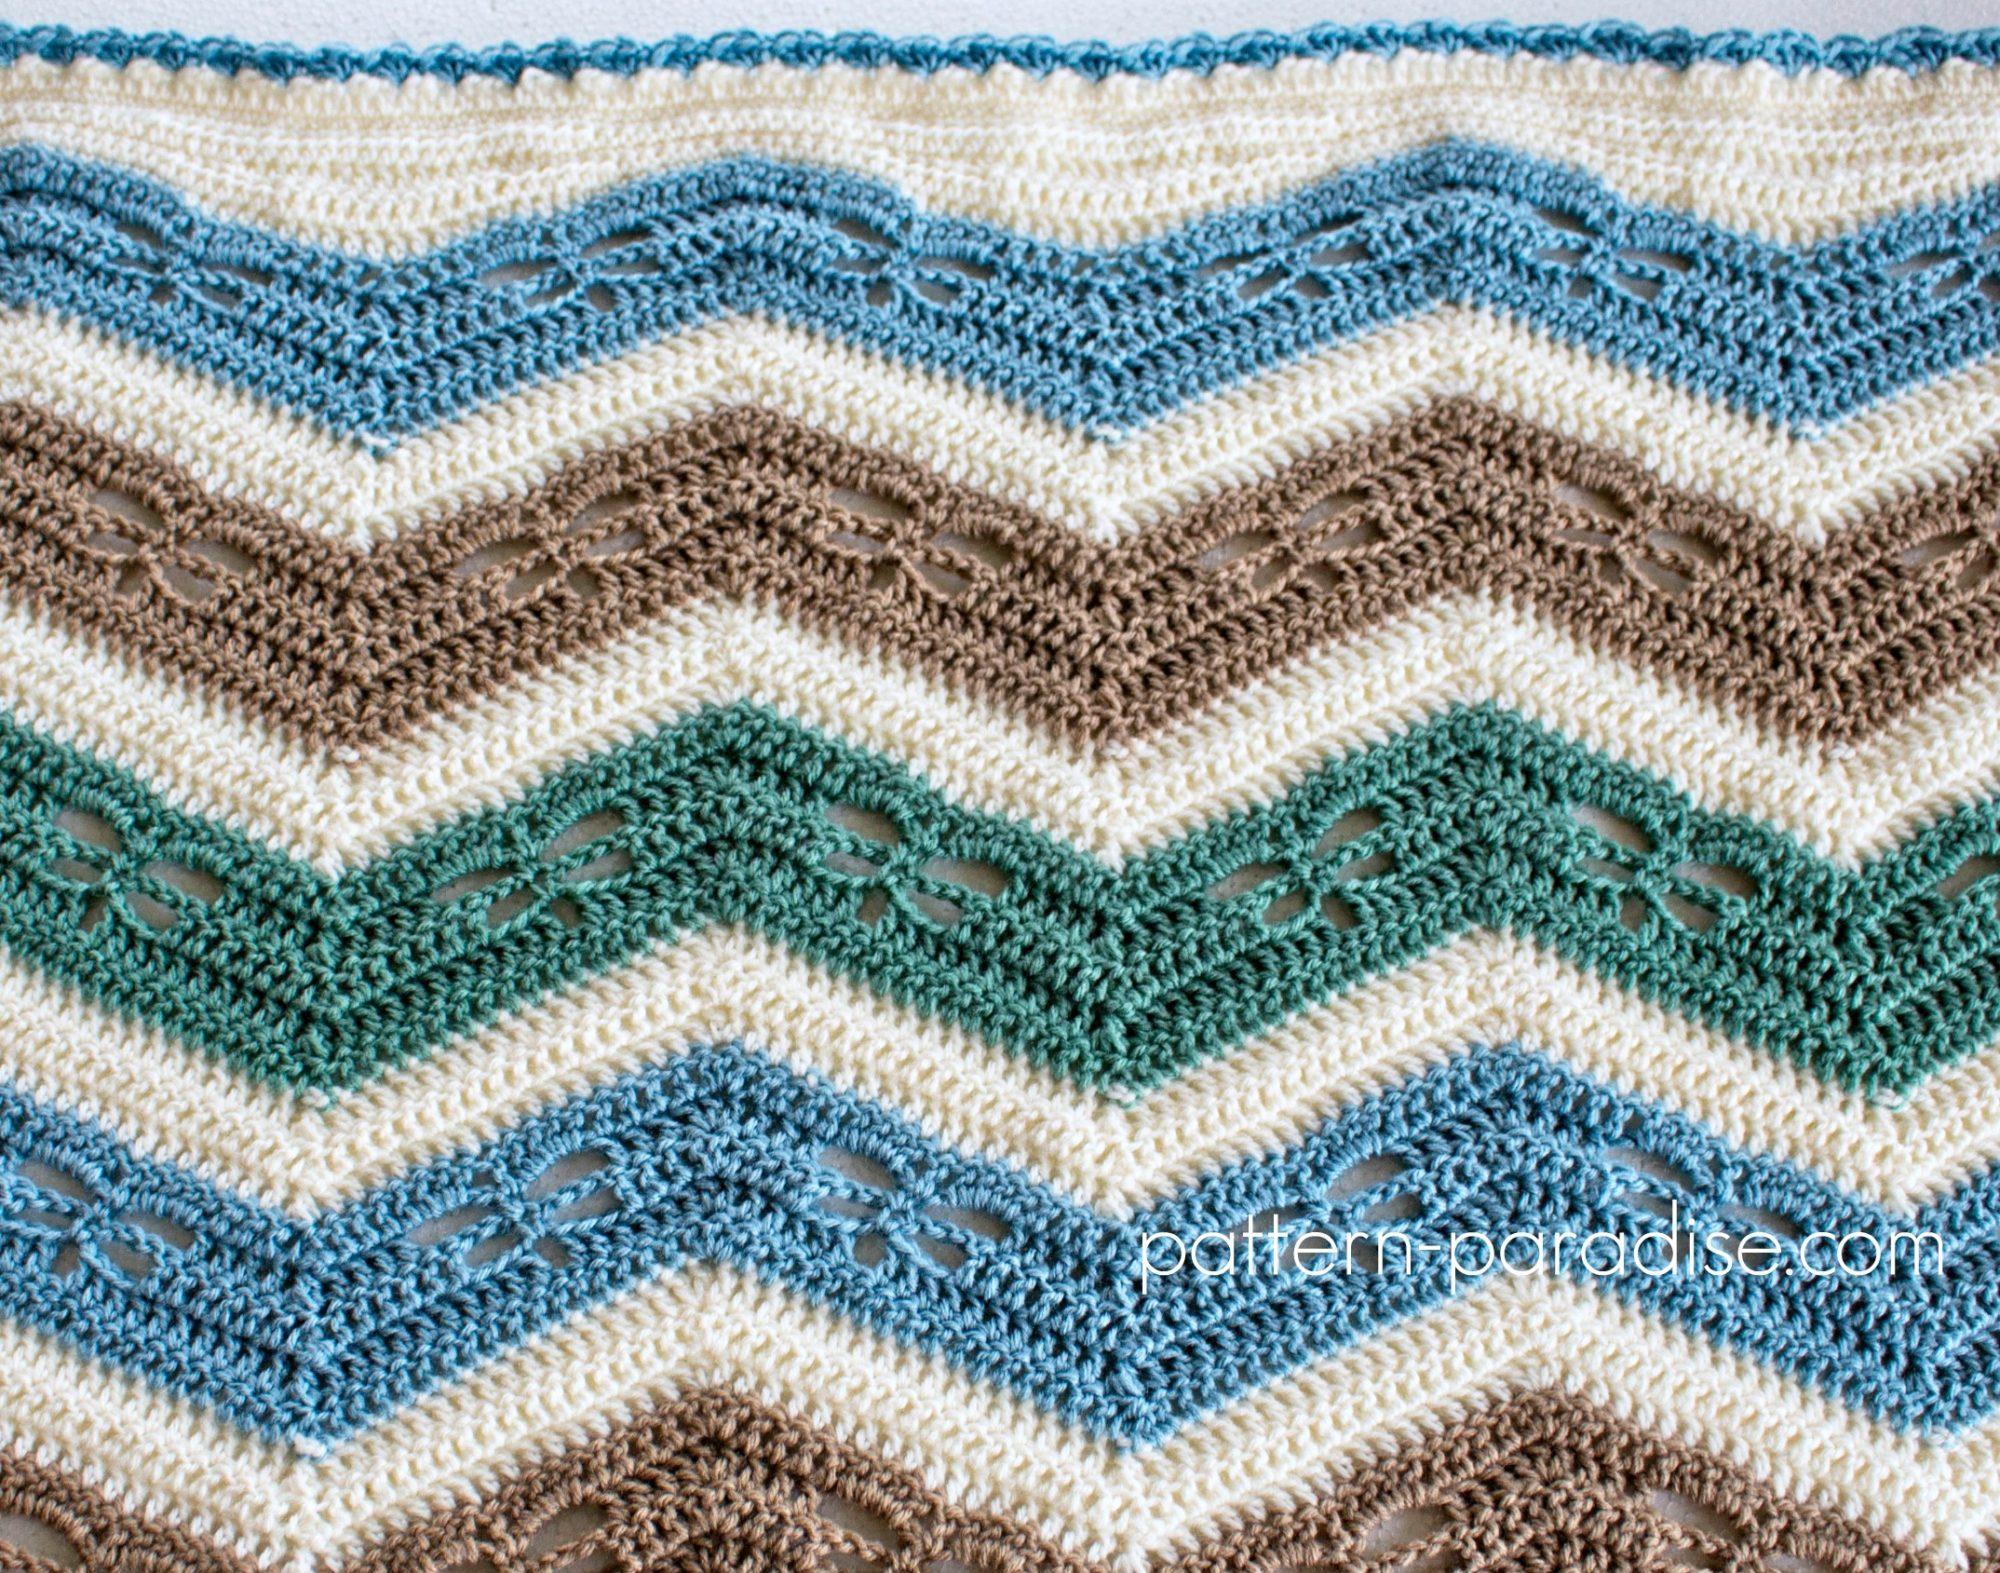 Crochet Dragonfly Baby Blanket Pattern : Free Crochet Pattern: Dragonfly Chevron Baby Blanket ...